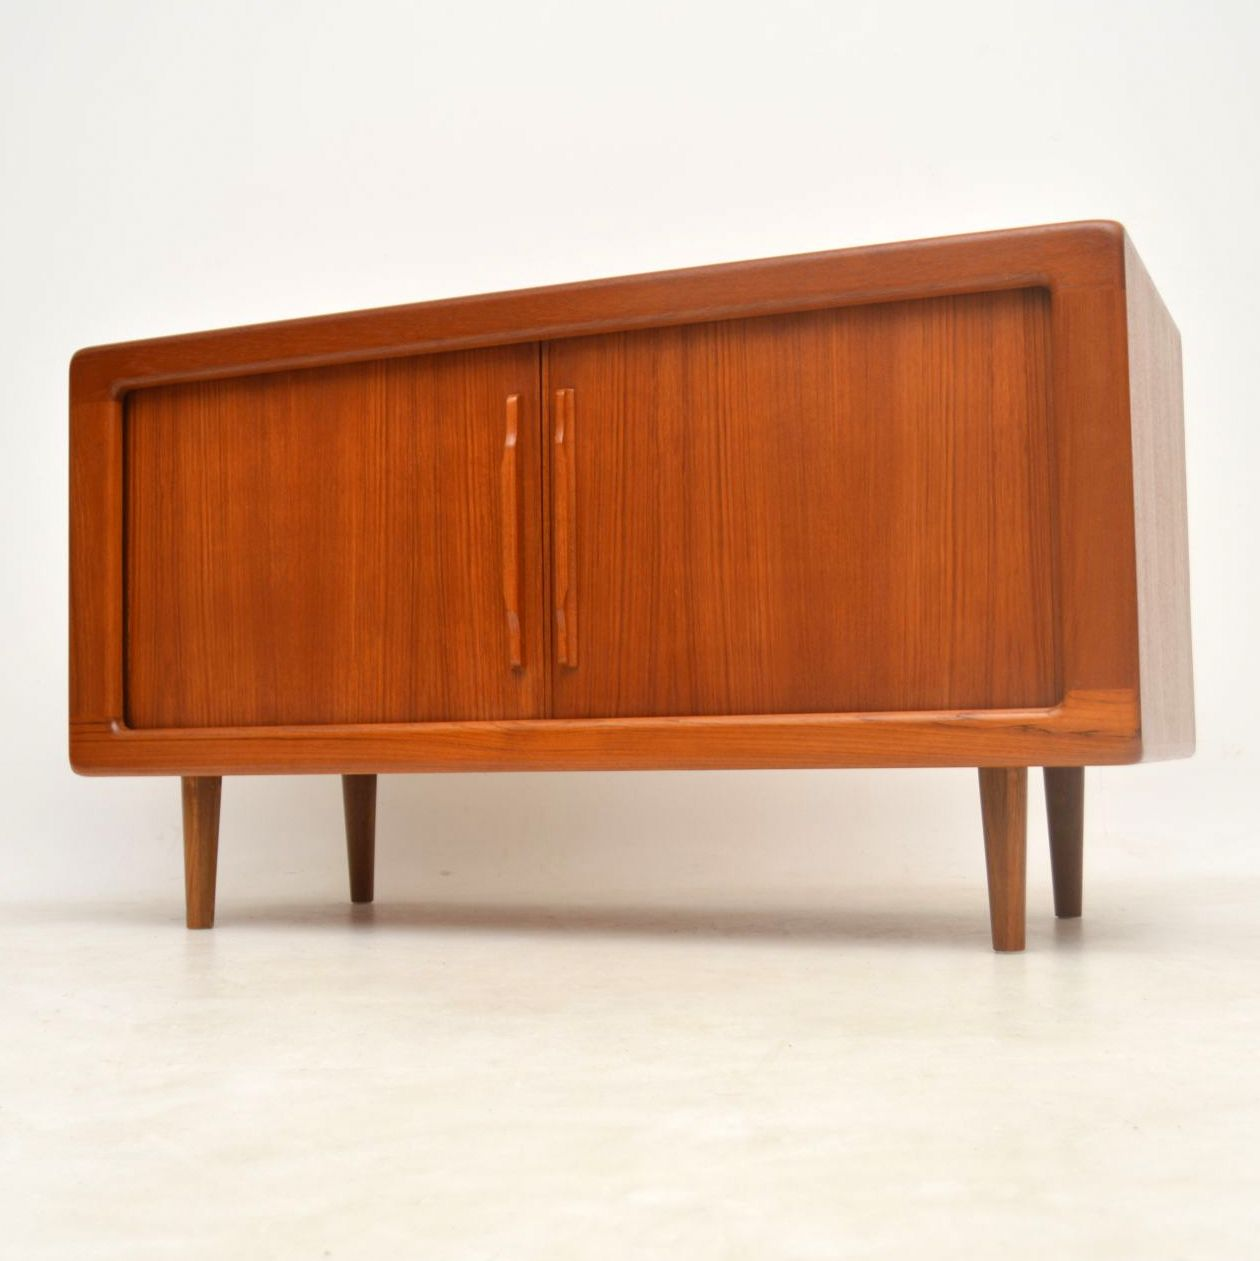 1960 S Danish Vintage Teak Sideboard Retrospective